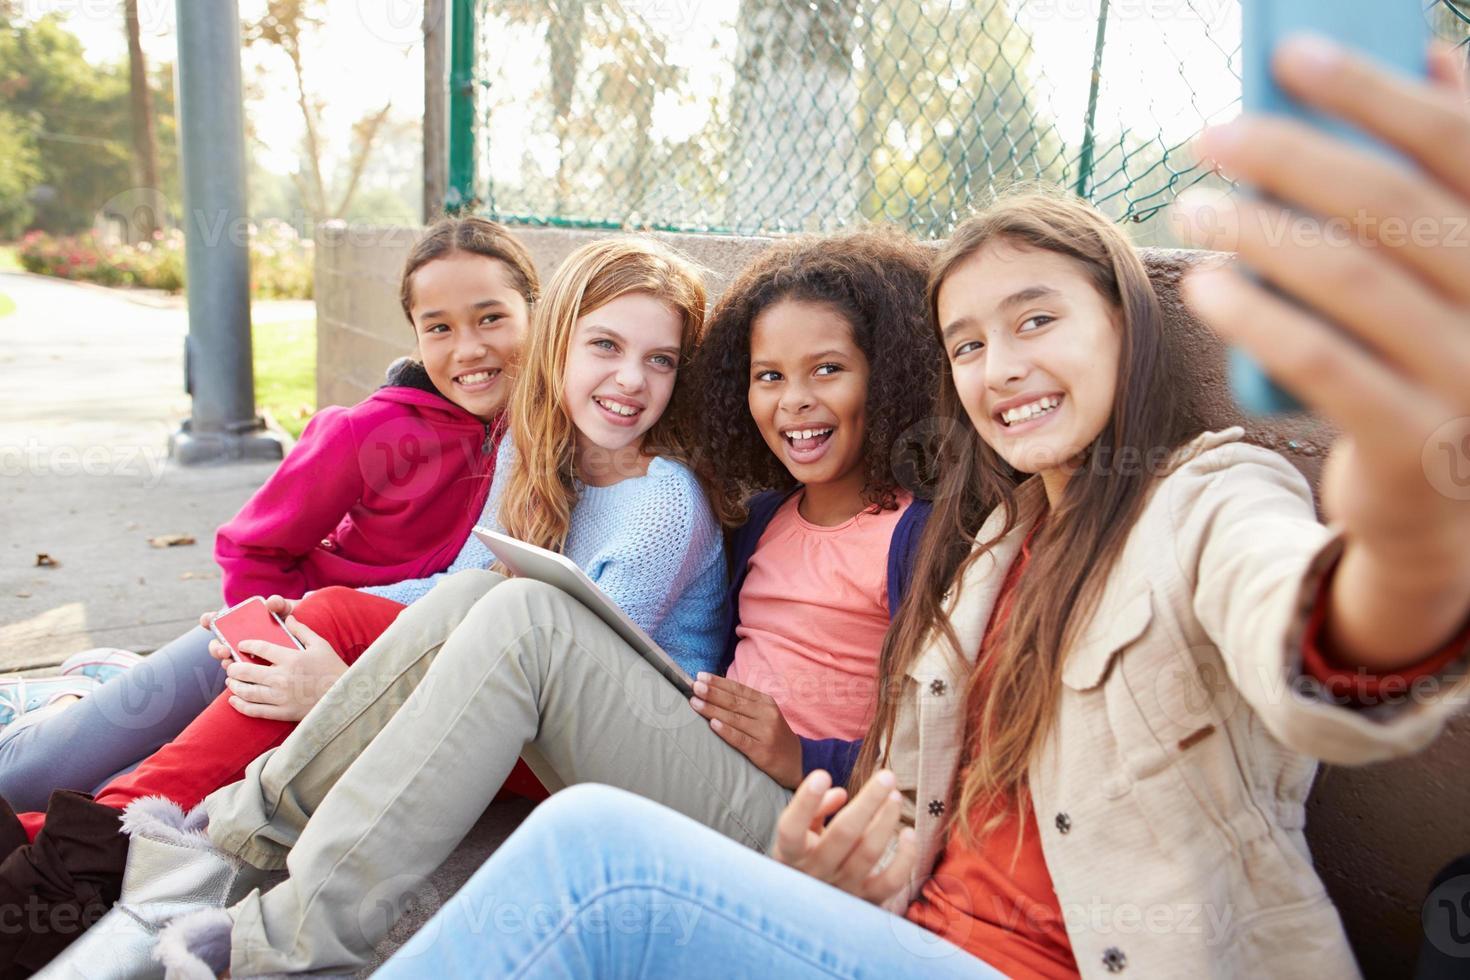 unga flickor tar selfie med mobiltelefonen i park foto